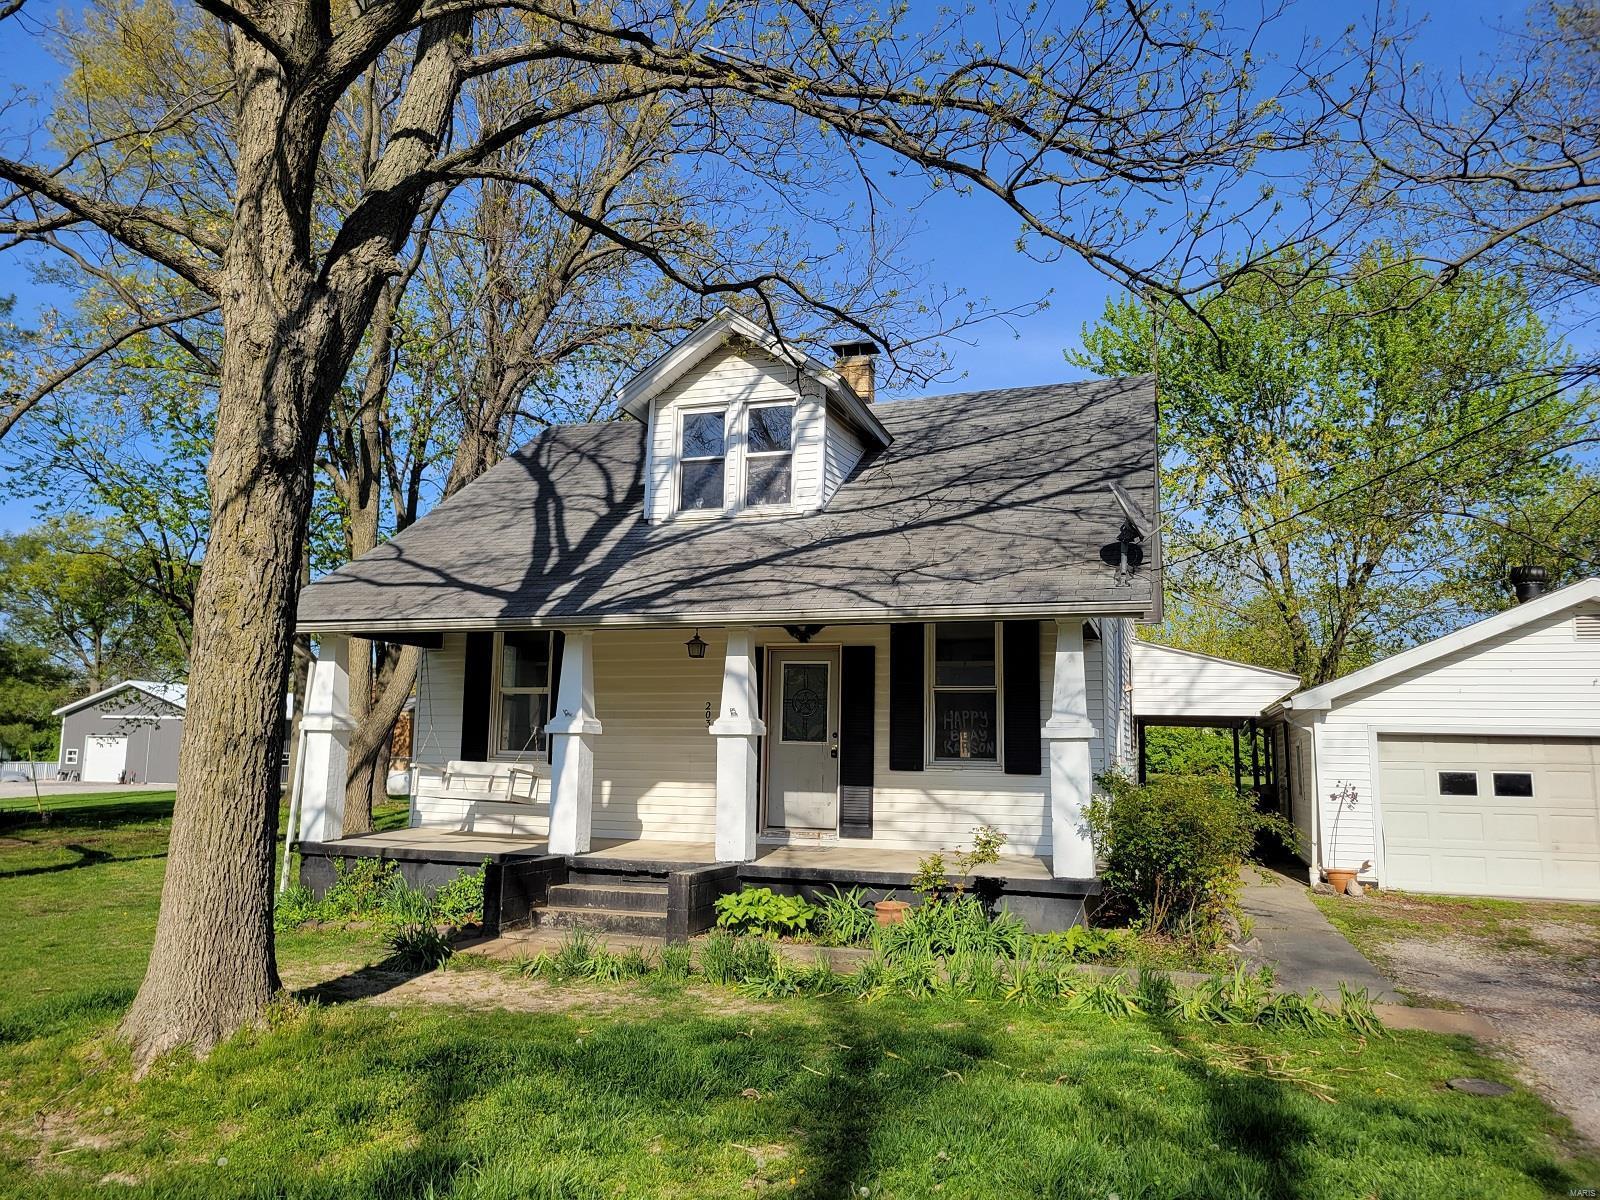 203 S Walnut Street Property Photo - Freeburg, IL real estate listing